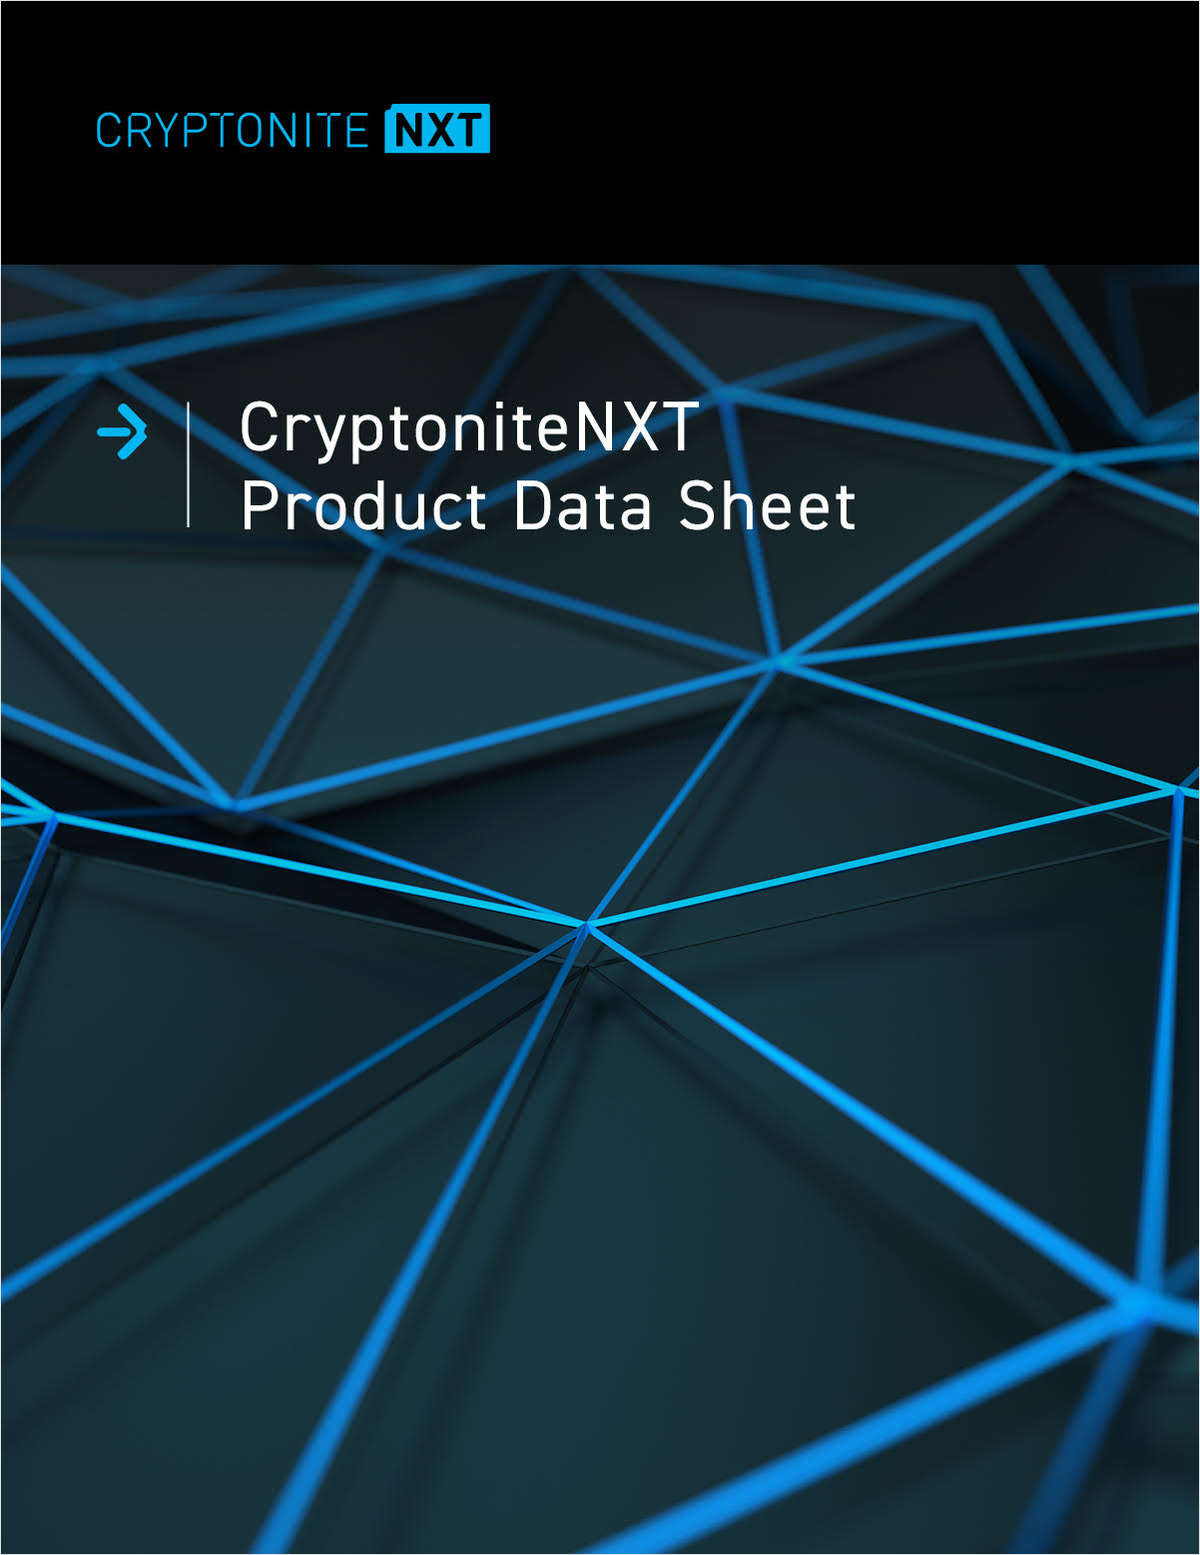 CryptoniteNXT Data Sheet